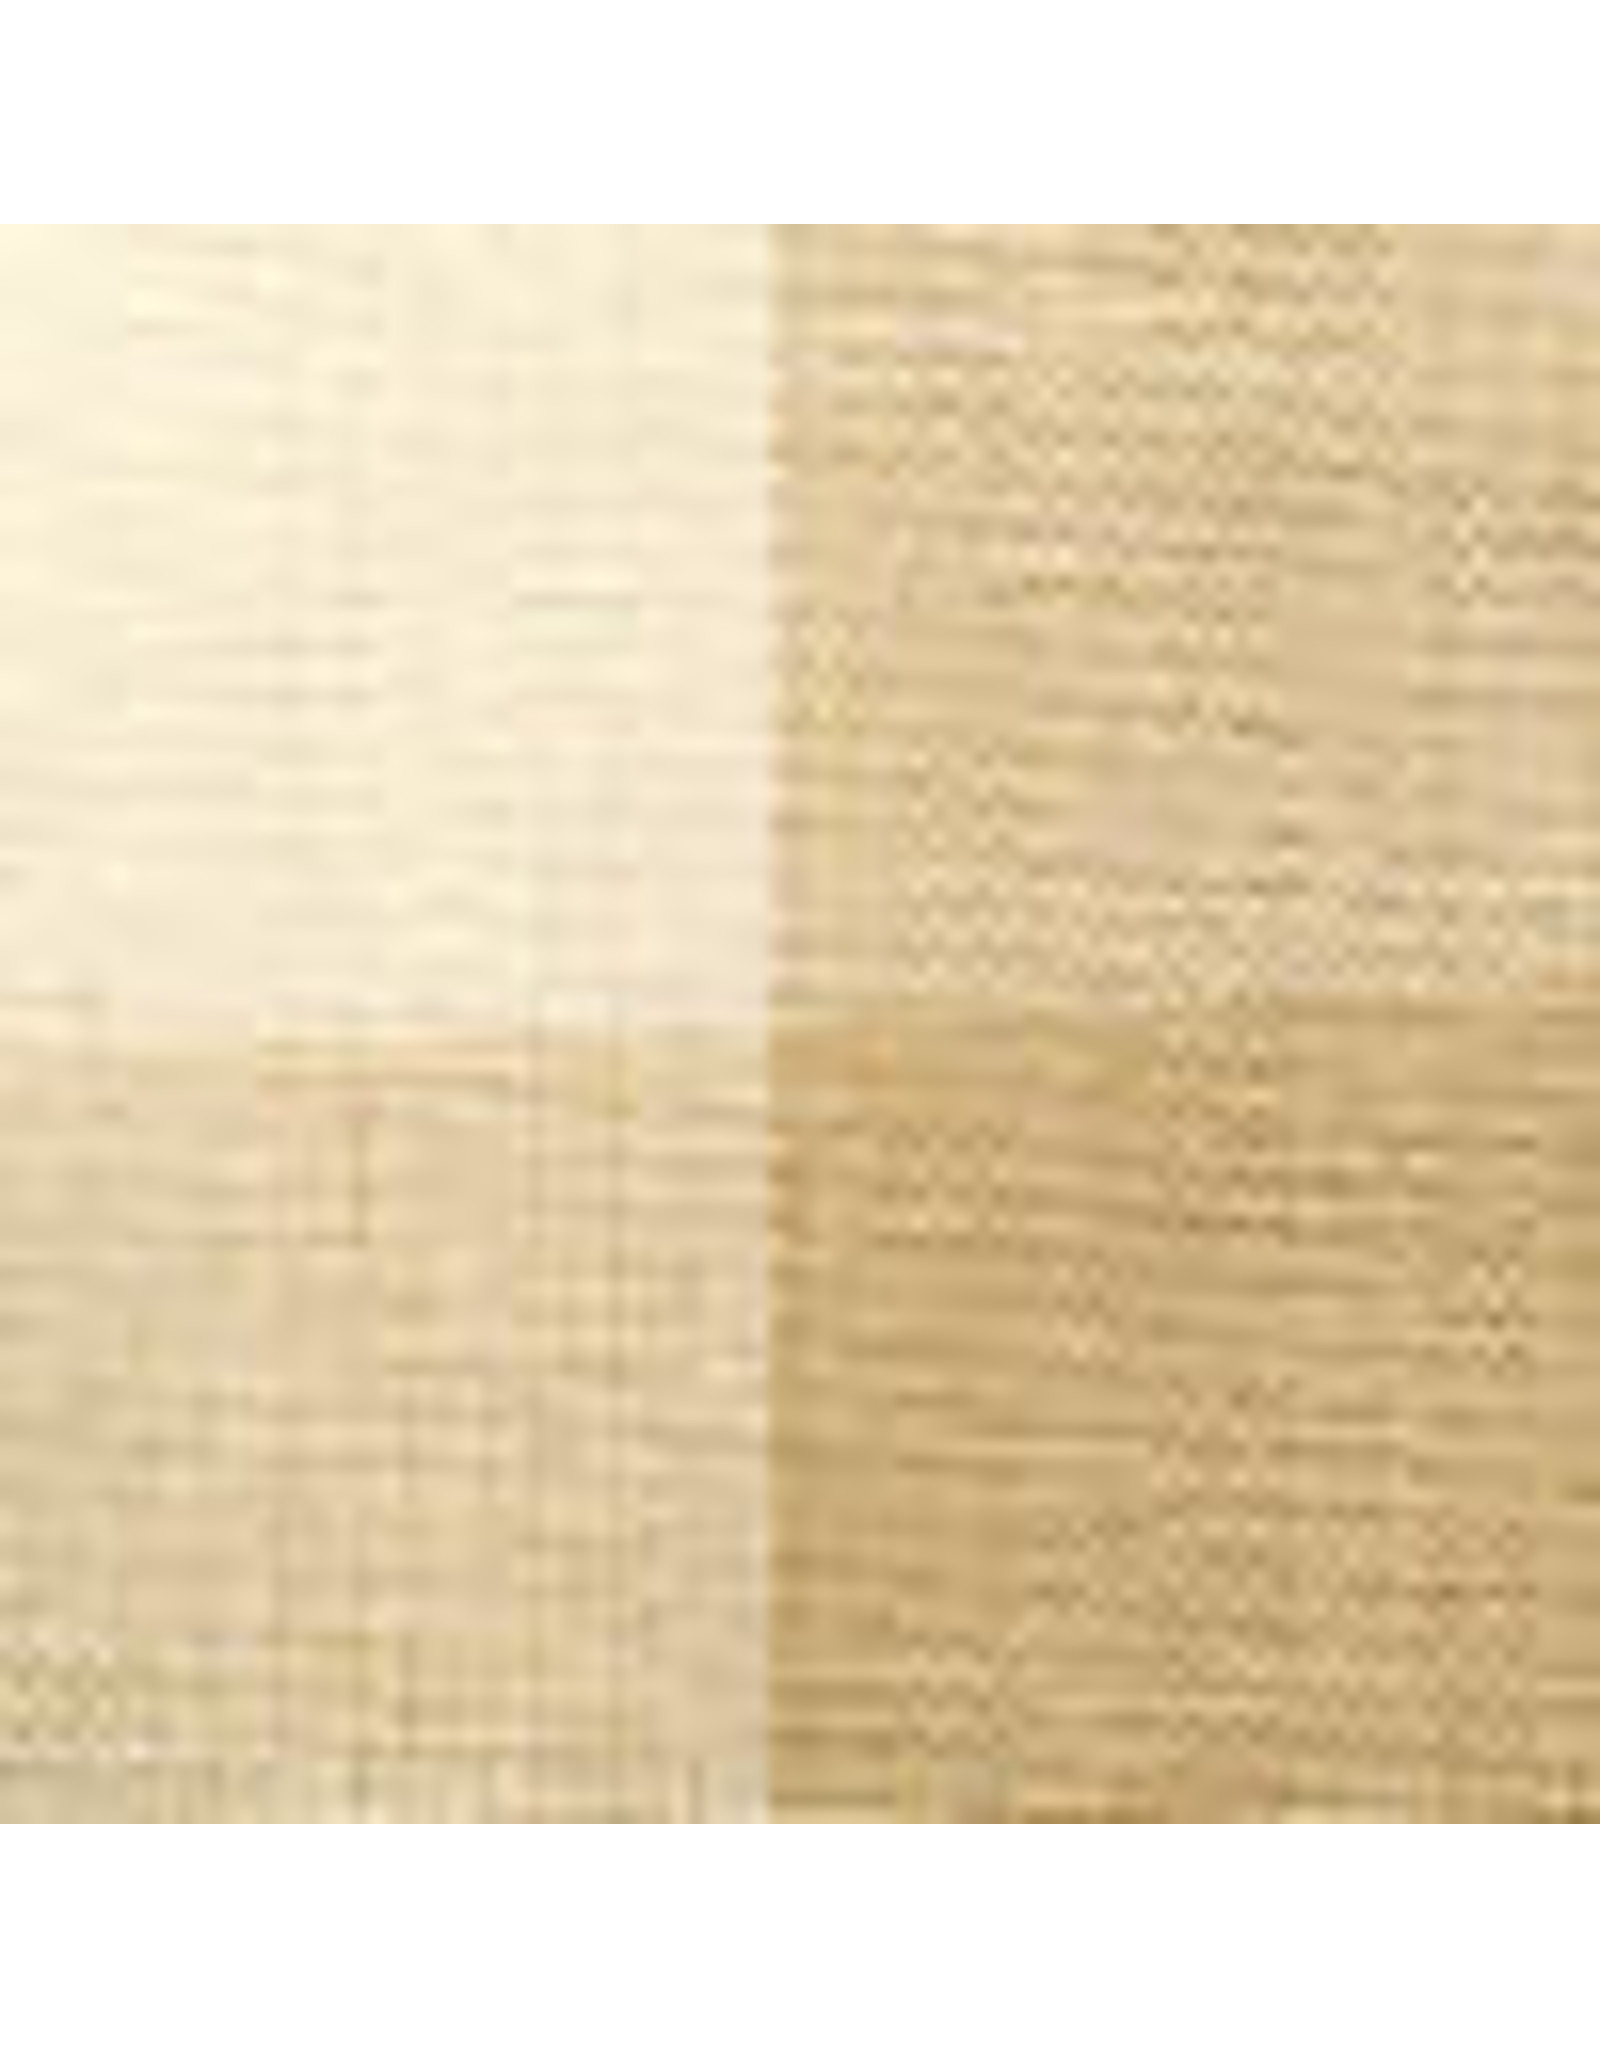 Yd. Wheat and Cream Buffalo Check Fabric #89